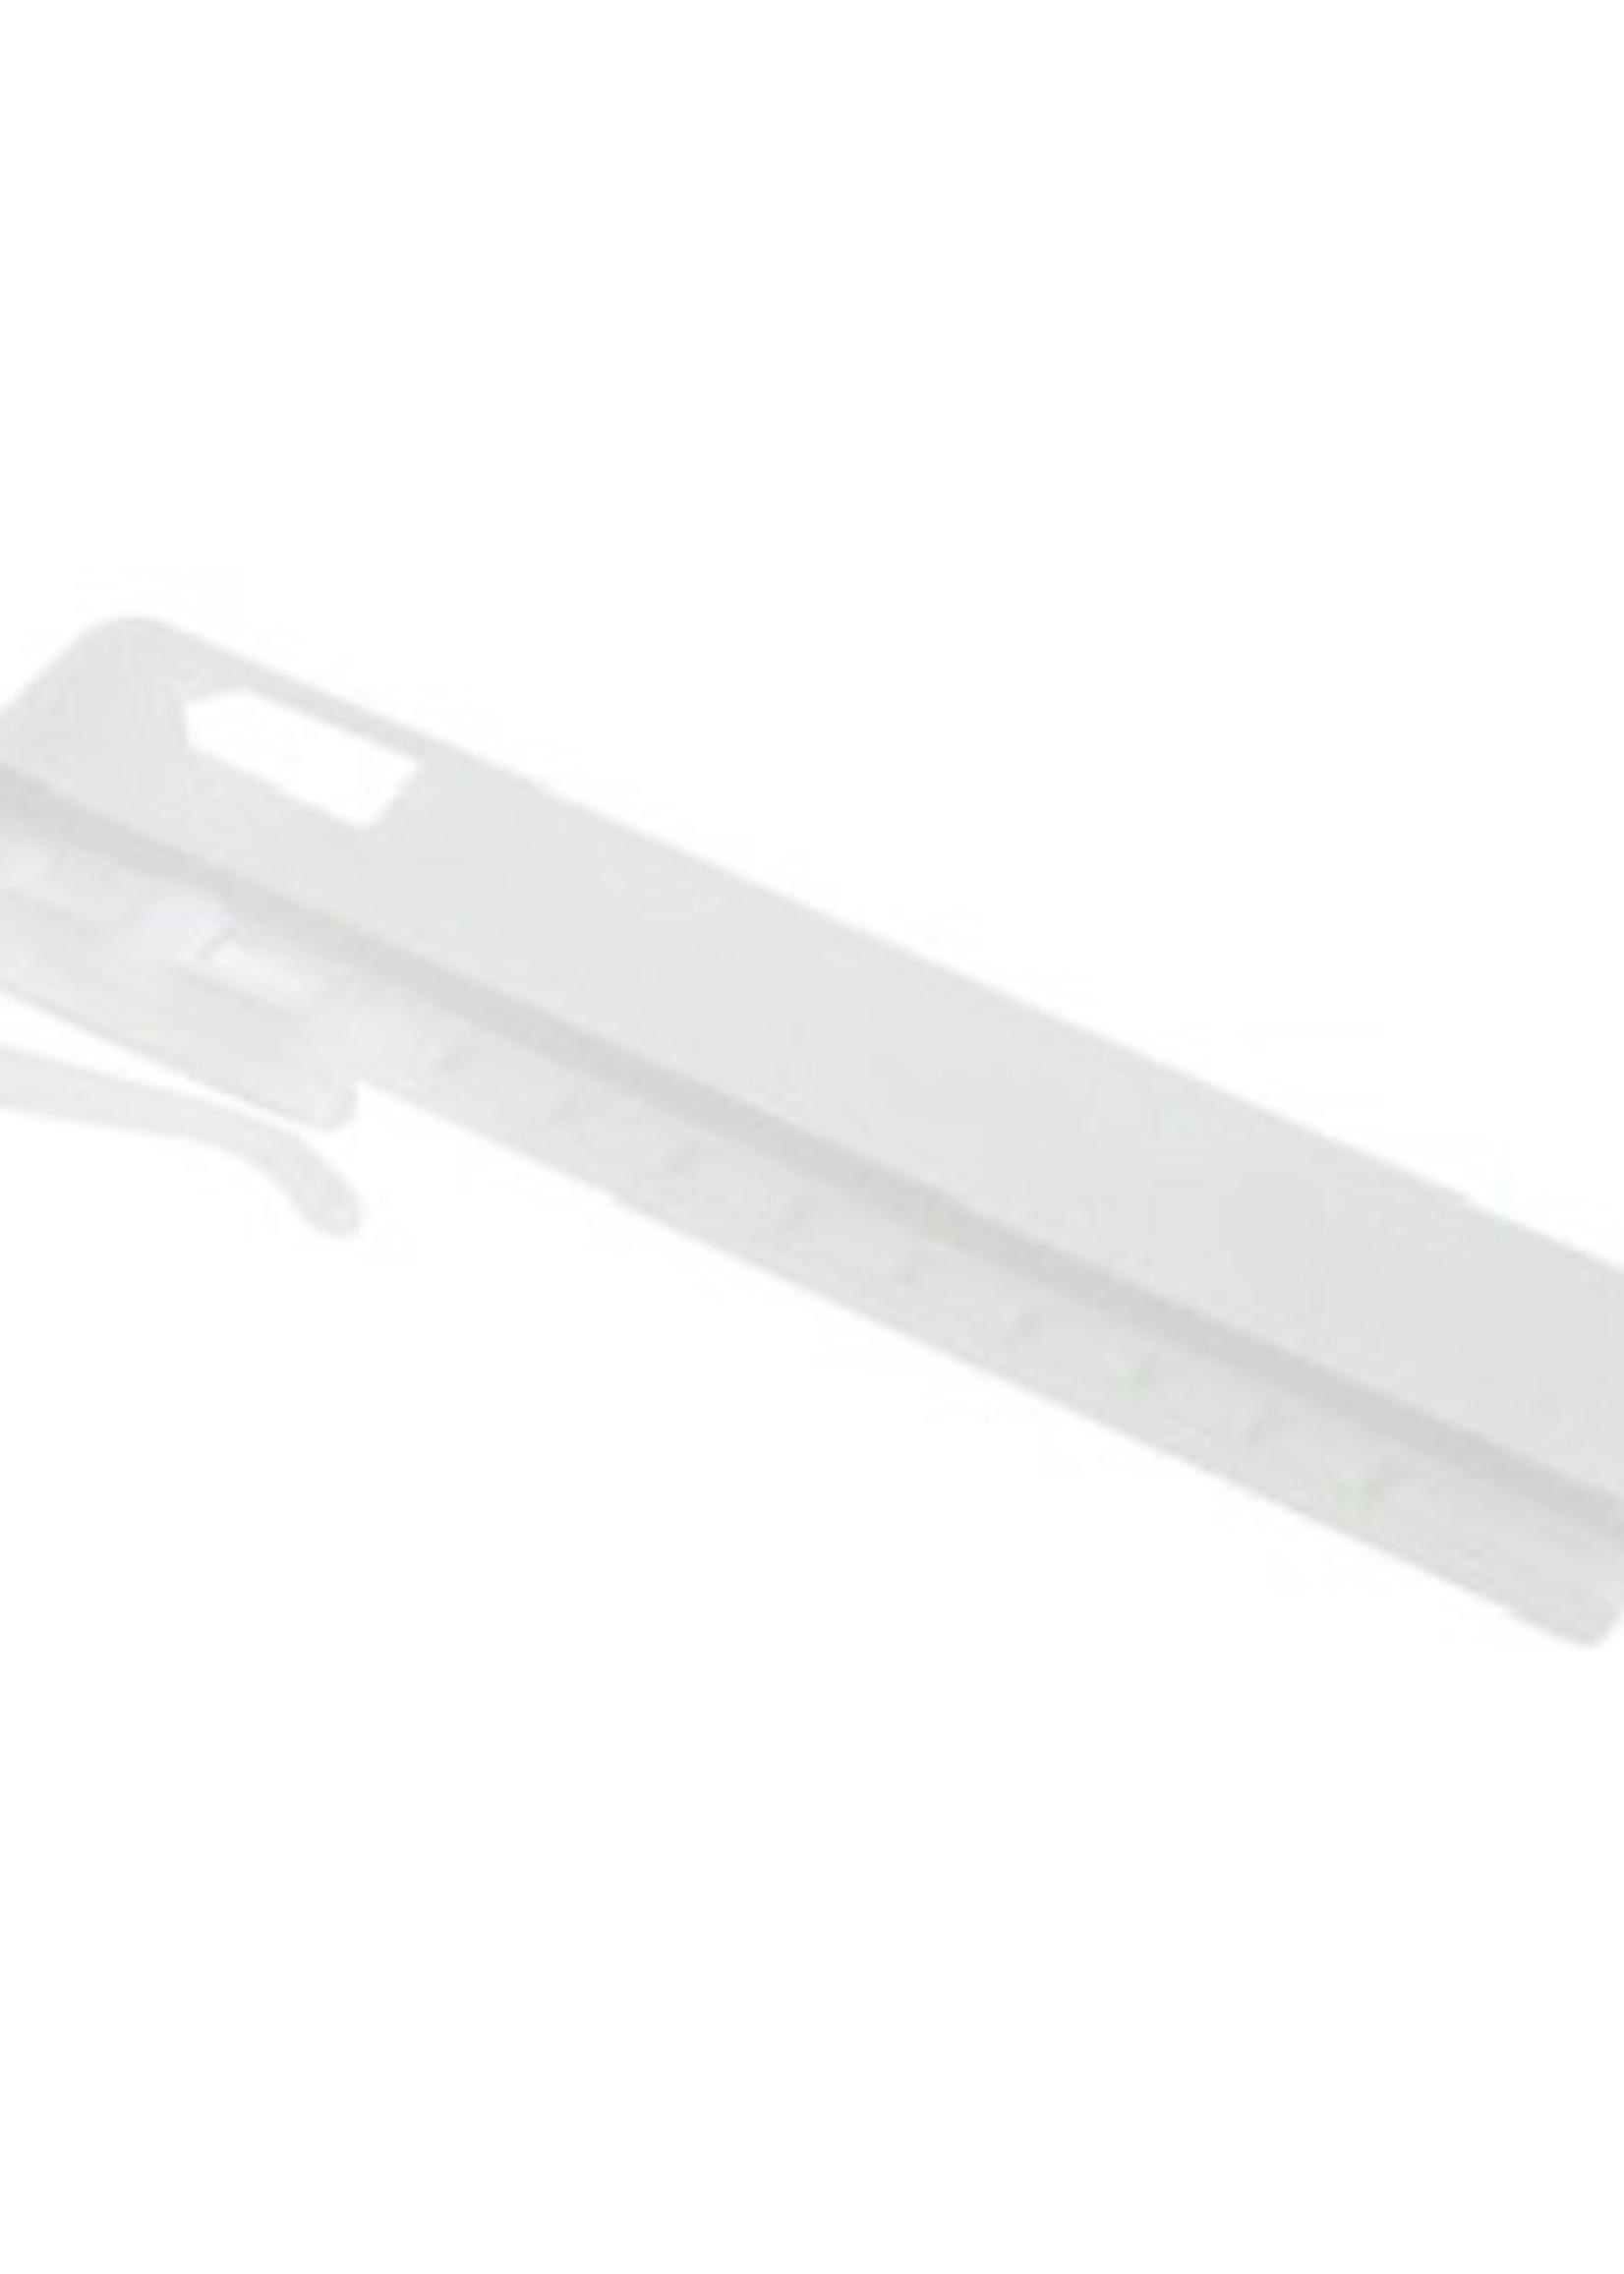 Microflex Innaai verstelbare gordijnhaak 5cm  verpakt per 500 stuks